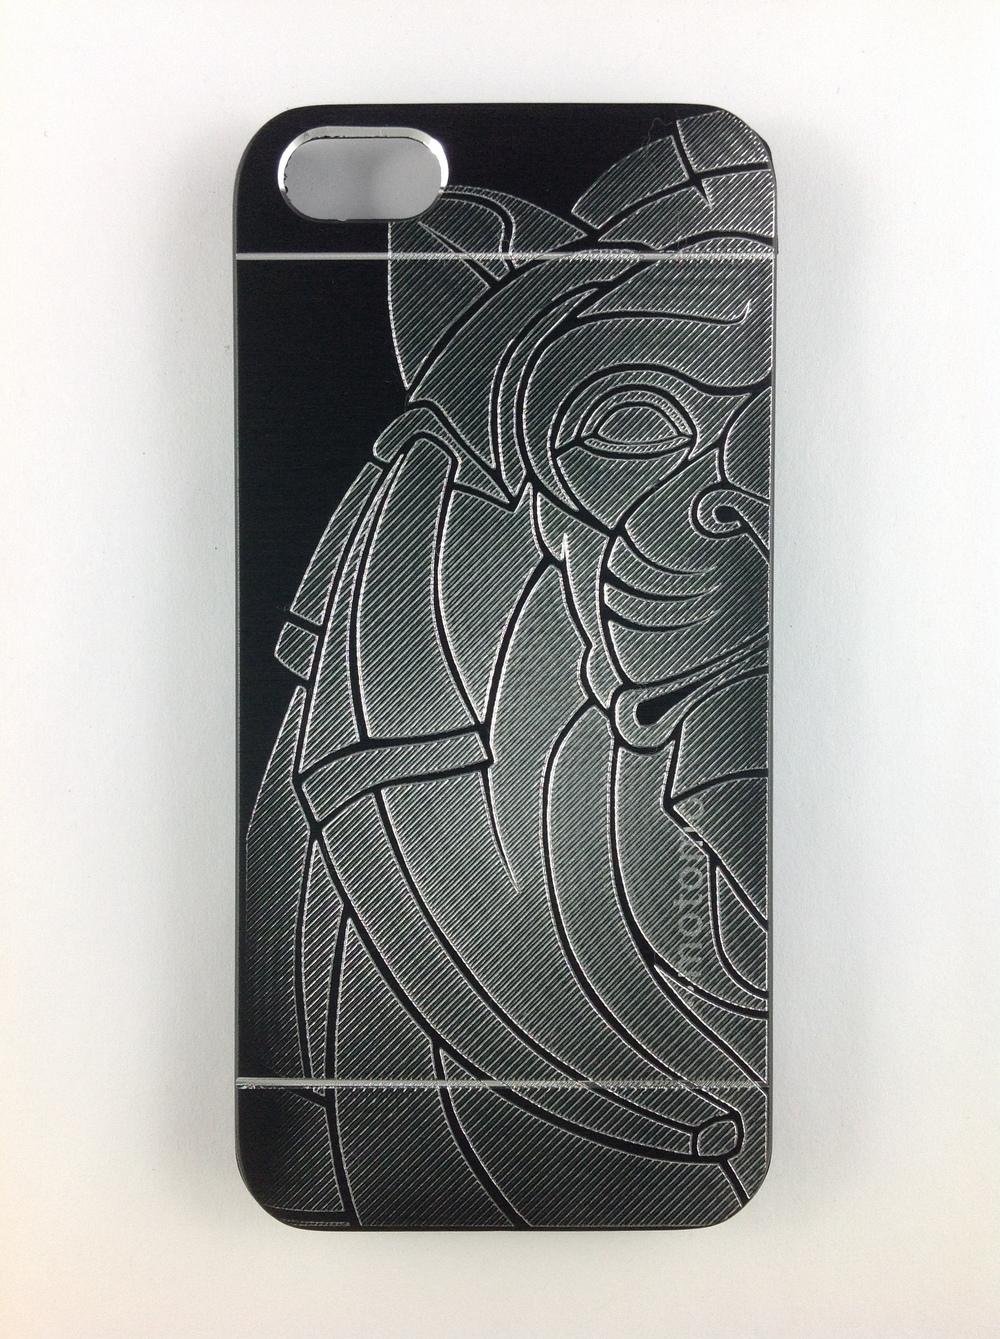 DigitalCarver-iPhone5s-IMG_3701.JPG